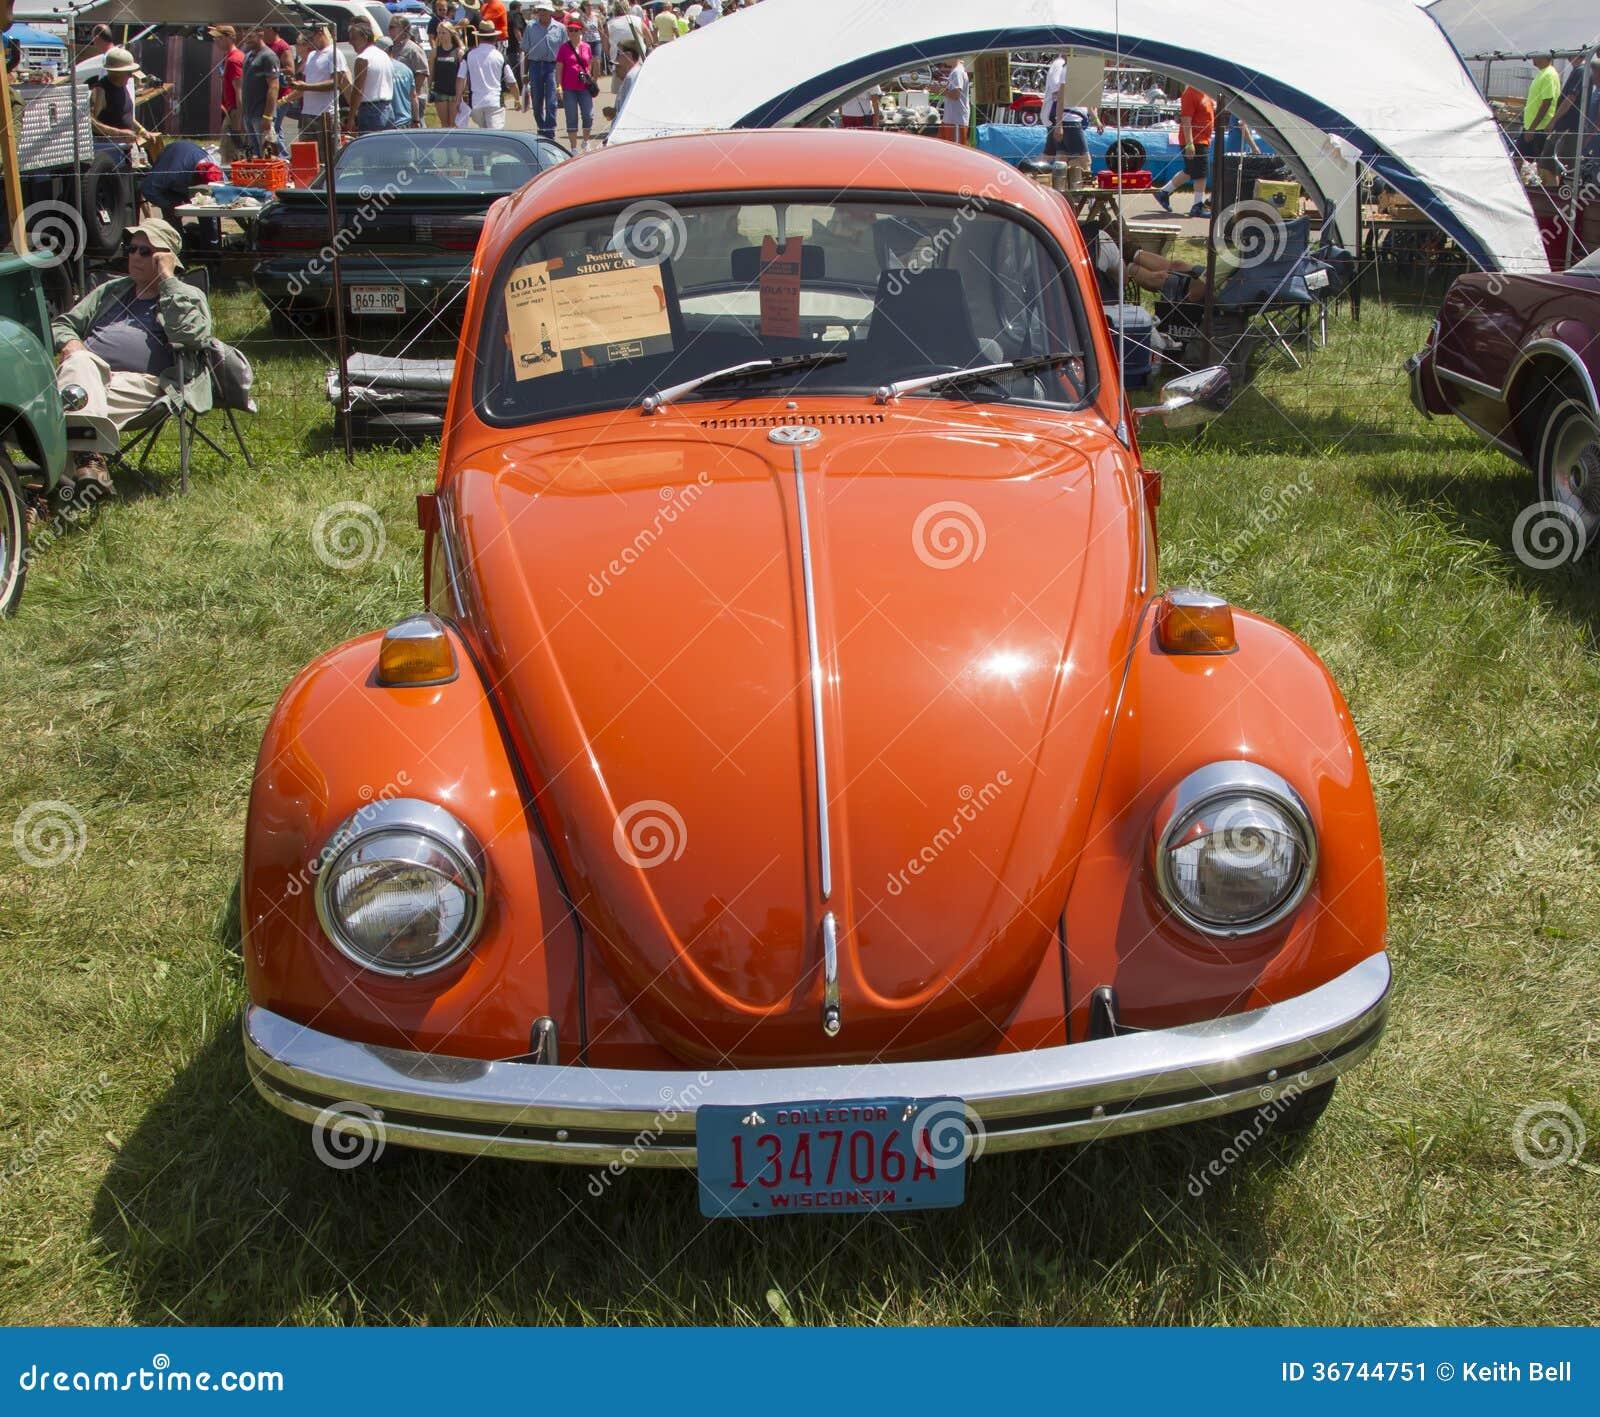 1971 Orange VW Beetle Front View Editorial Photo - Image: 36744751